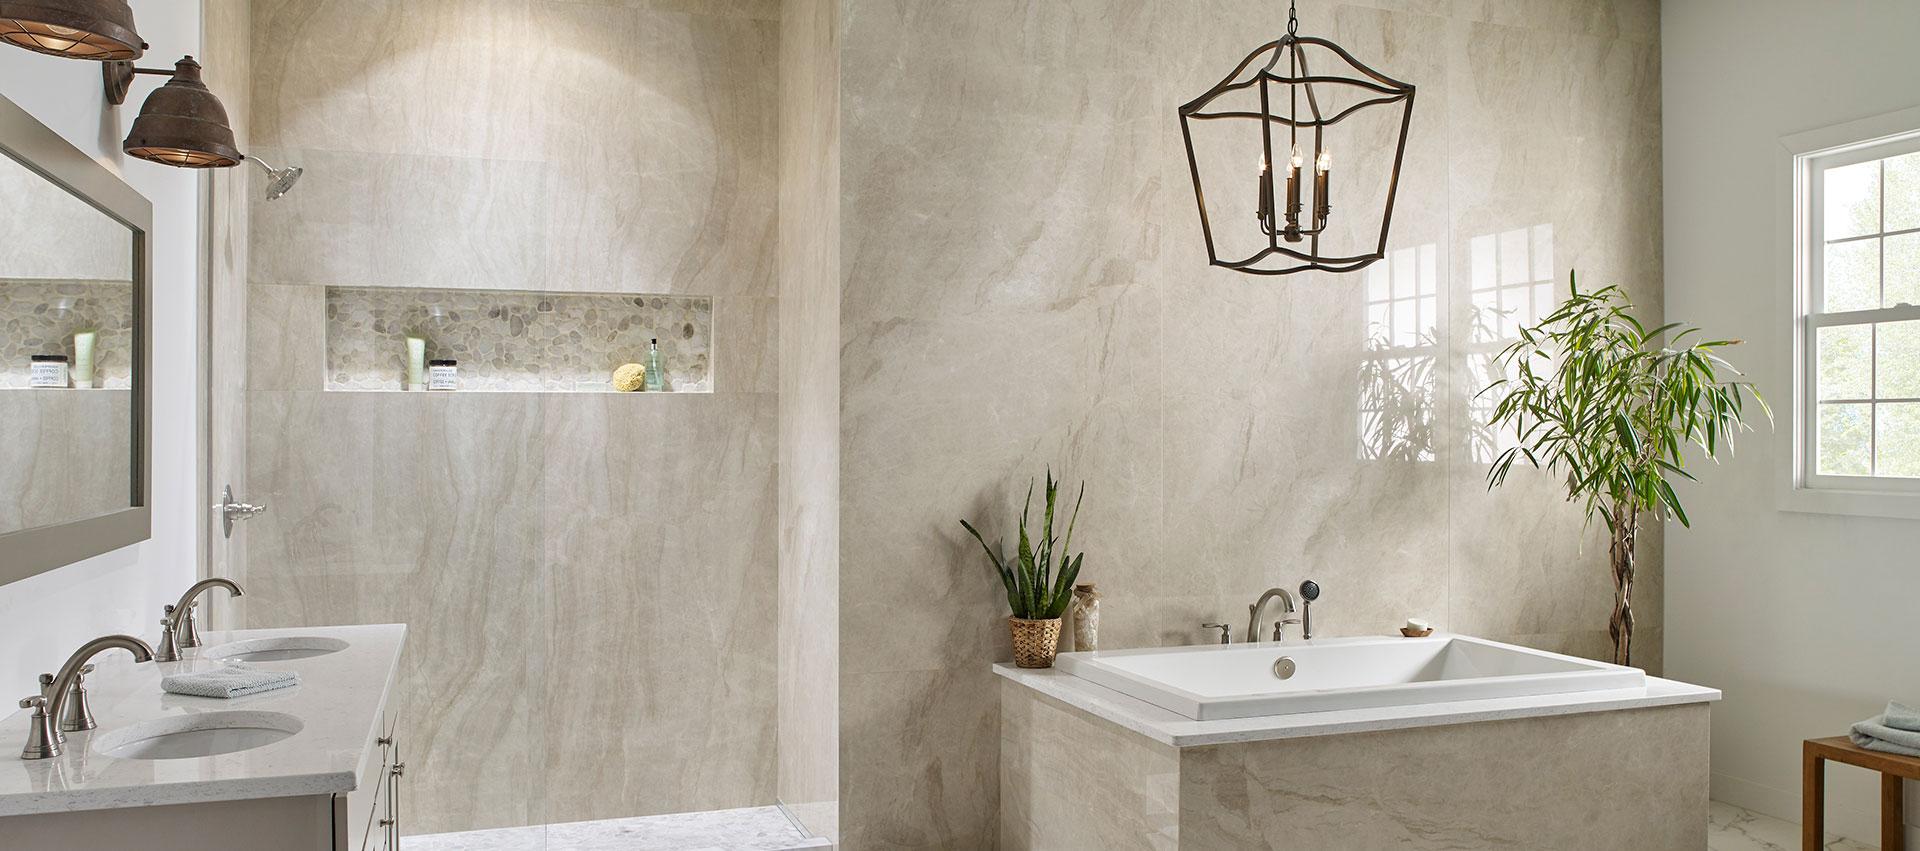 Porcelain Tile Installation >> Stile by MSI | Stile Porcelain Slabs | Thin Tile Slabs for